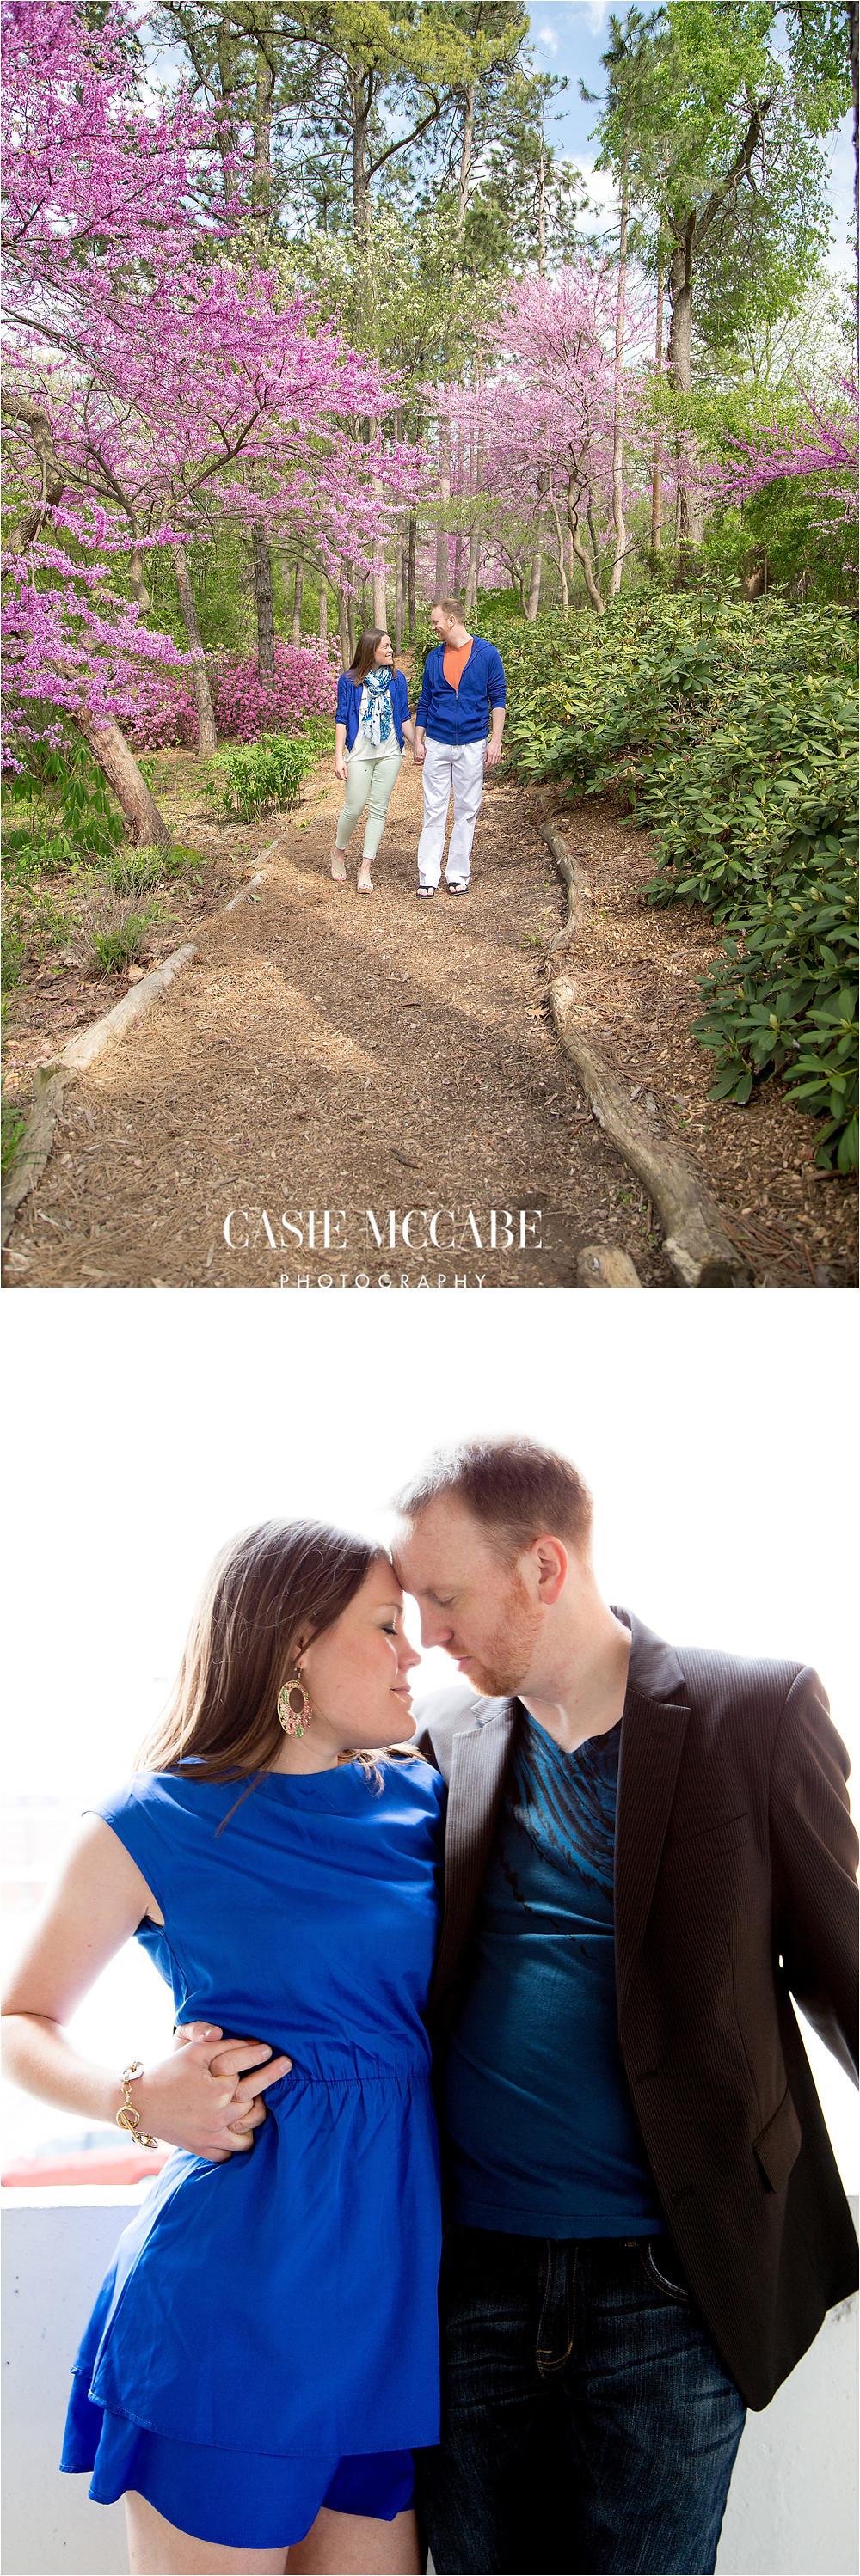 Couple on University of Michigan, Love, Casie McCabe Photography, Myrtle Beach, SC